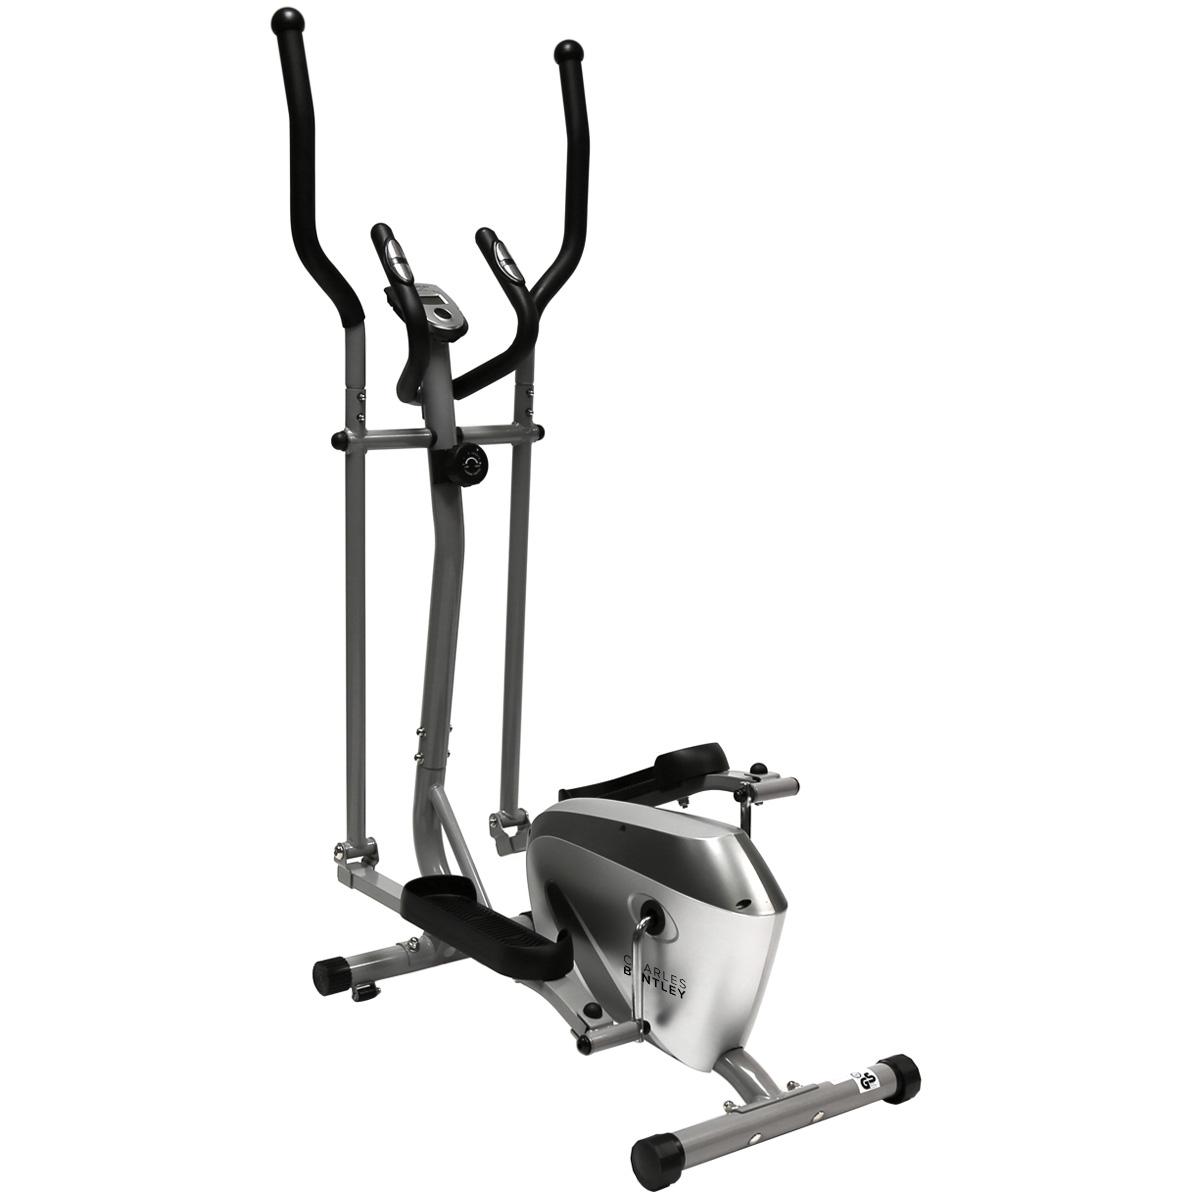 Fitness Equipment Uk: Charles Bentley Elliptical Cross Trainer Gym Machine Home